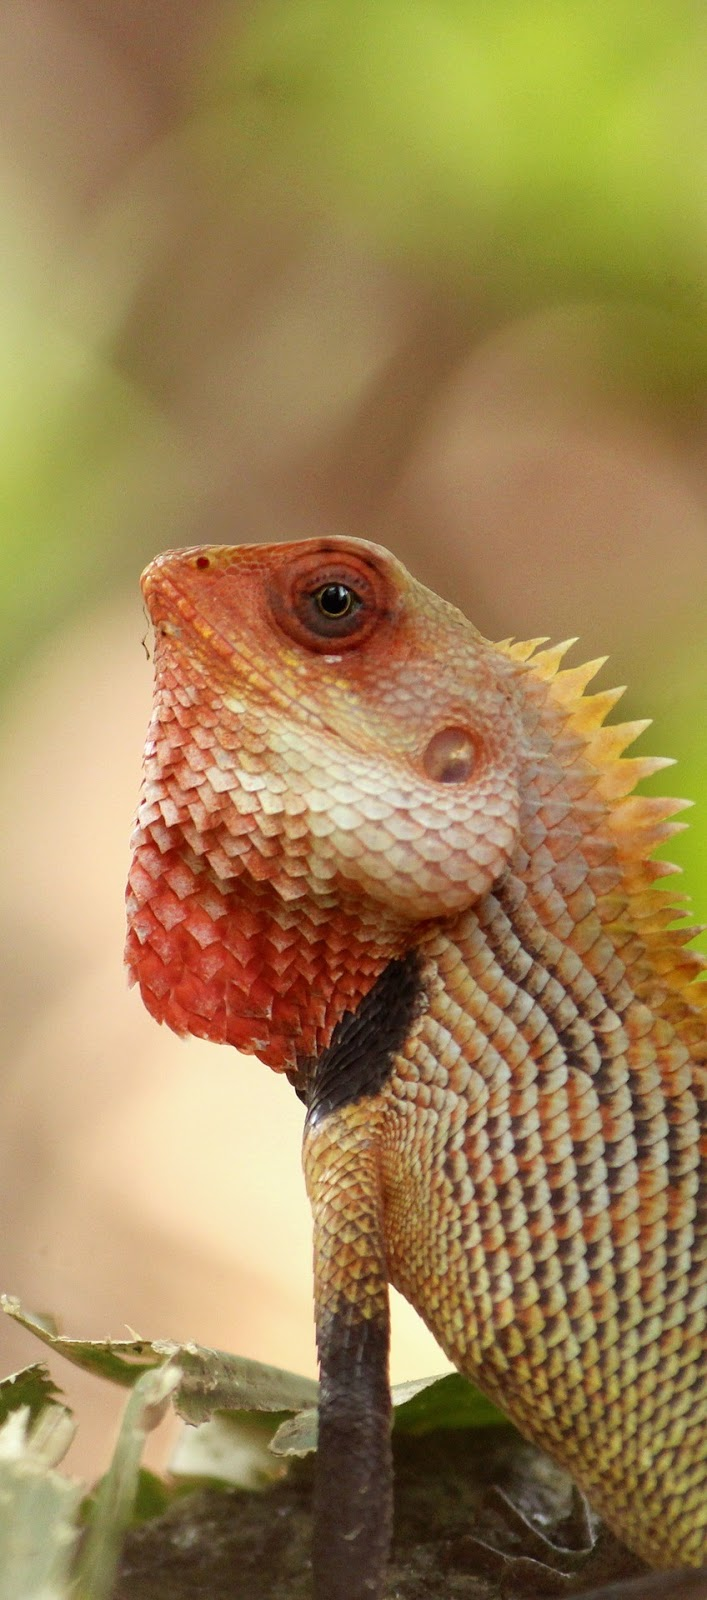 an oriental garden lizard - about wild animals